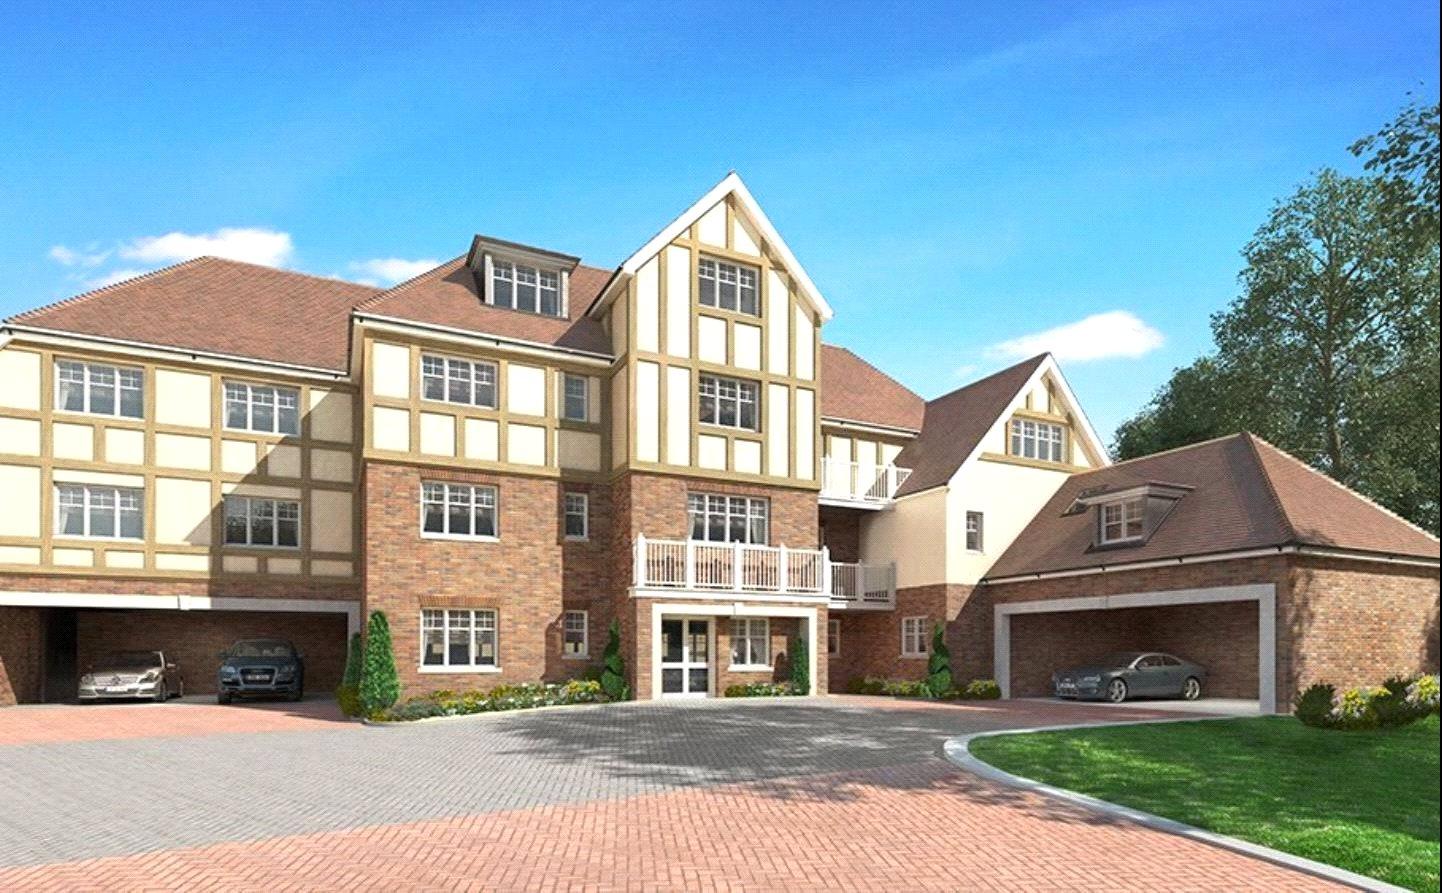 Meer voor Verkoop een t High Peak, London Road, Sunningdale, Berkshire, SL5 Sunningdale, Engeland